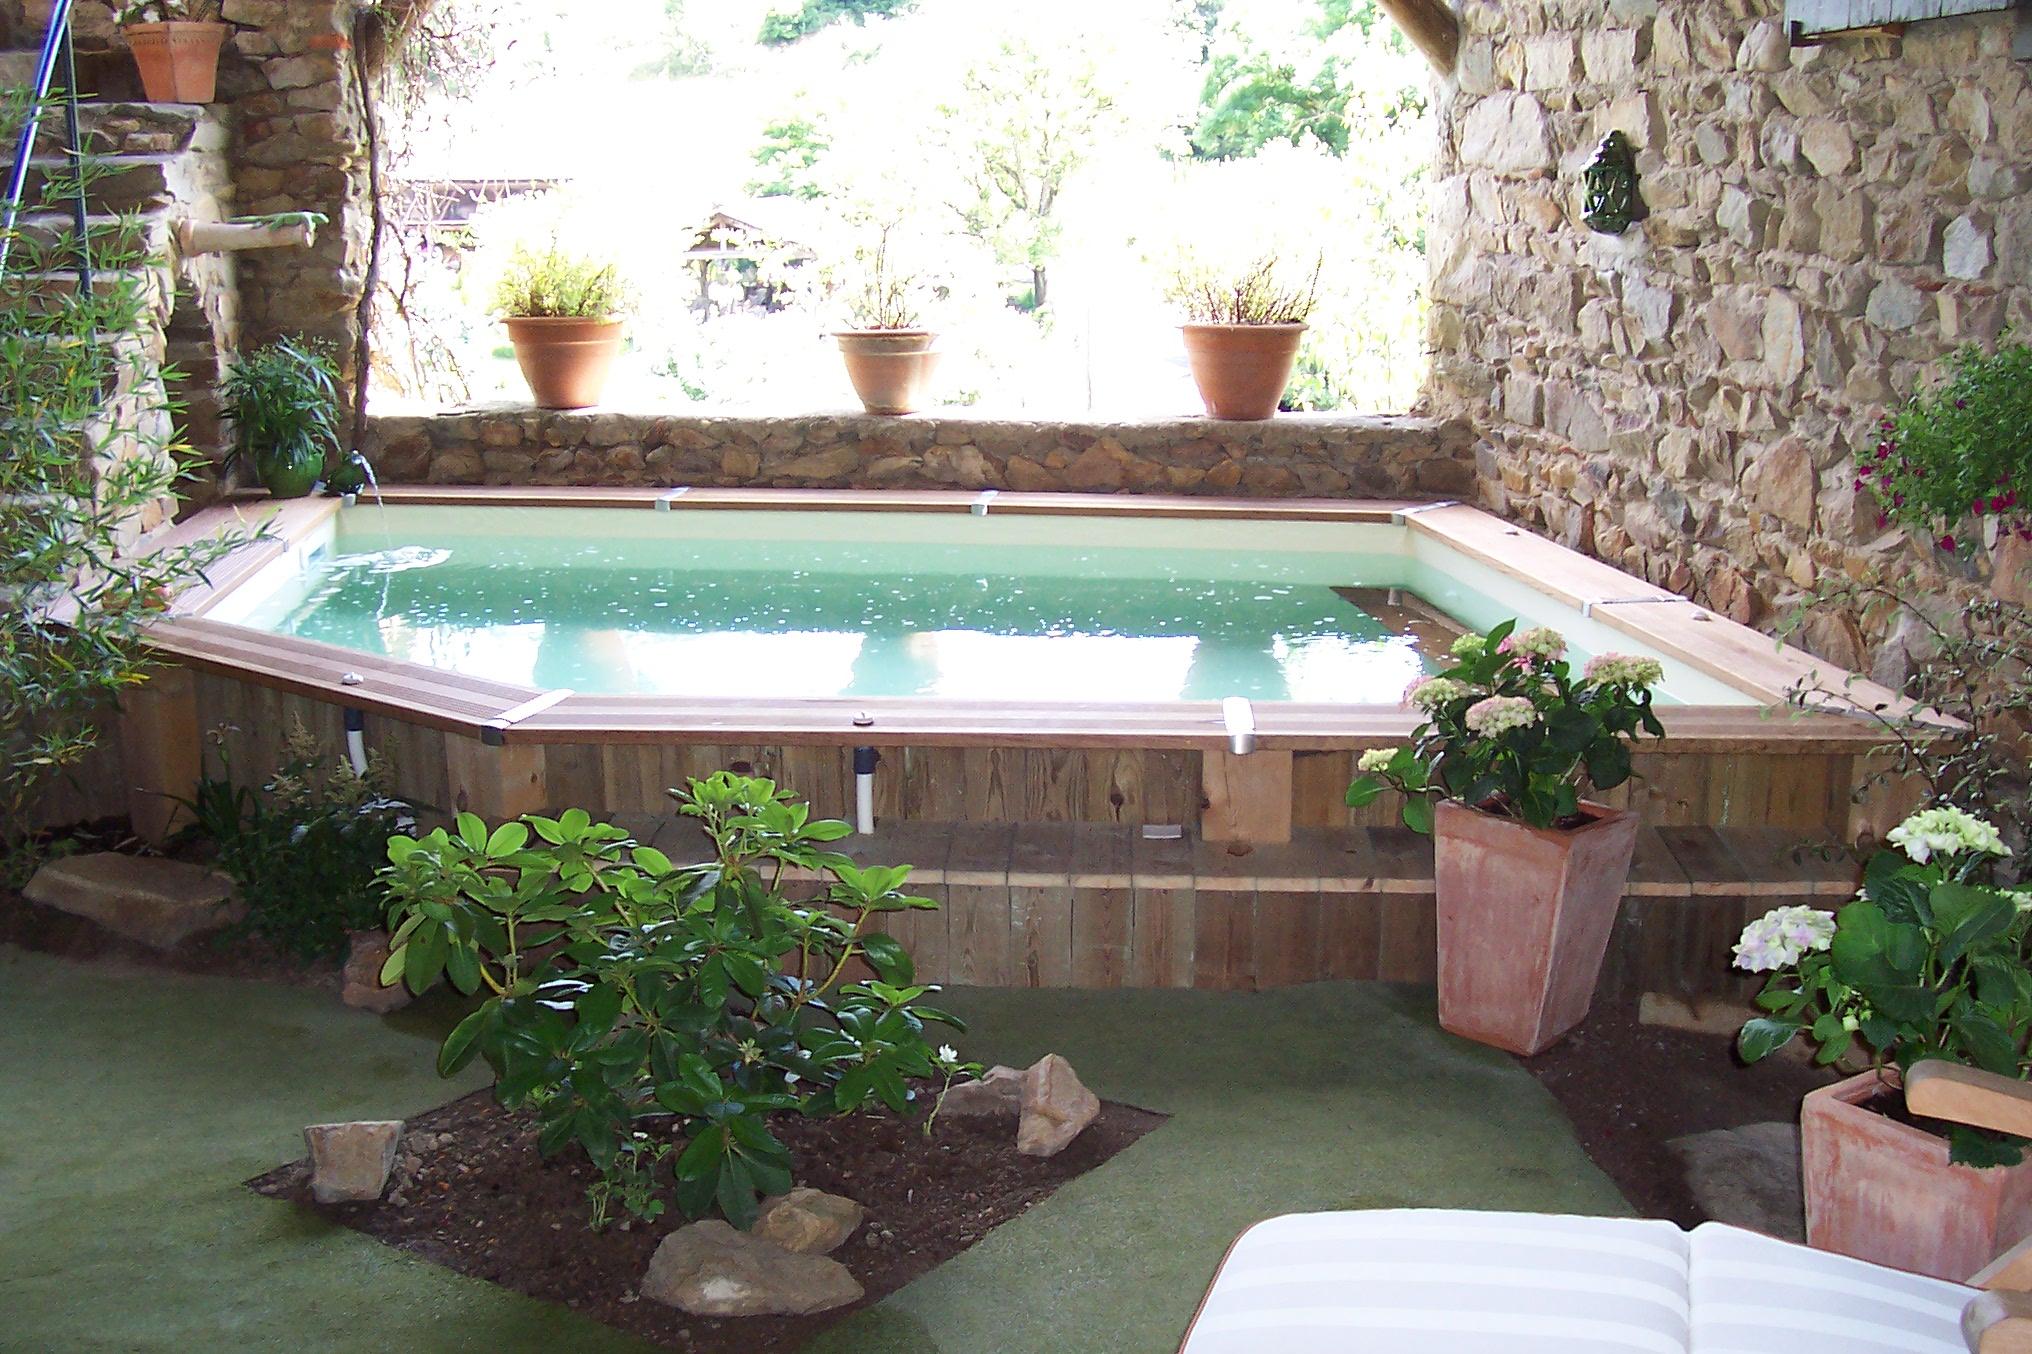 piscines bois lebonbain2 picardie piscine. Black Bedroom Furniture Sets. Home Design Ideas